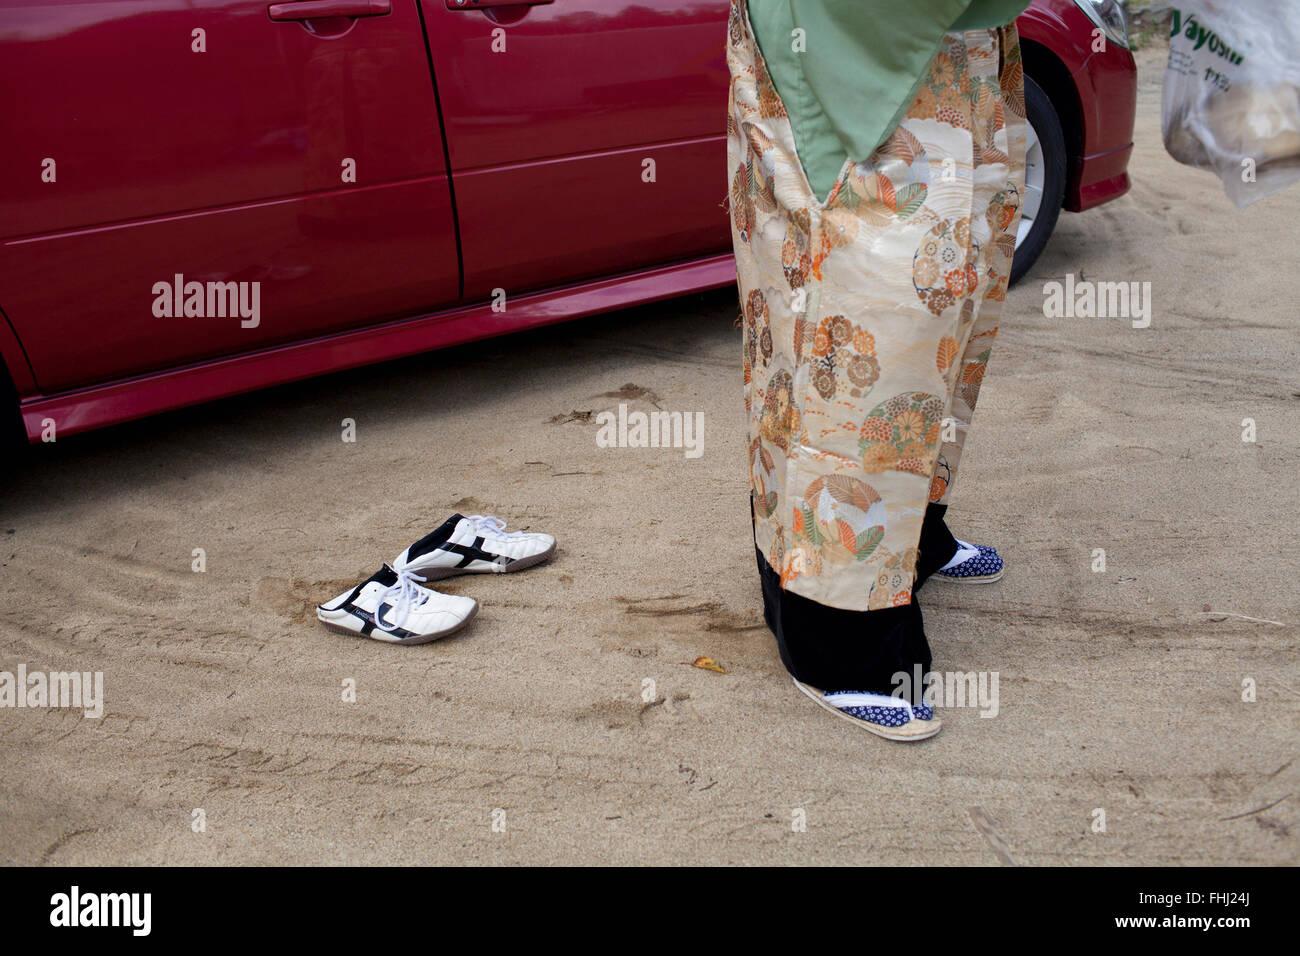 The Fukushima samurais -  Japan / Fukushima  -  Nomaoi Samurai Warrior changing modern shoes to Japanese sandals. - Stock Image